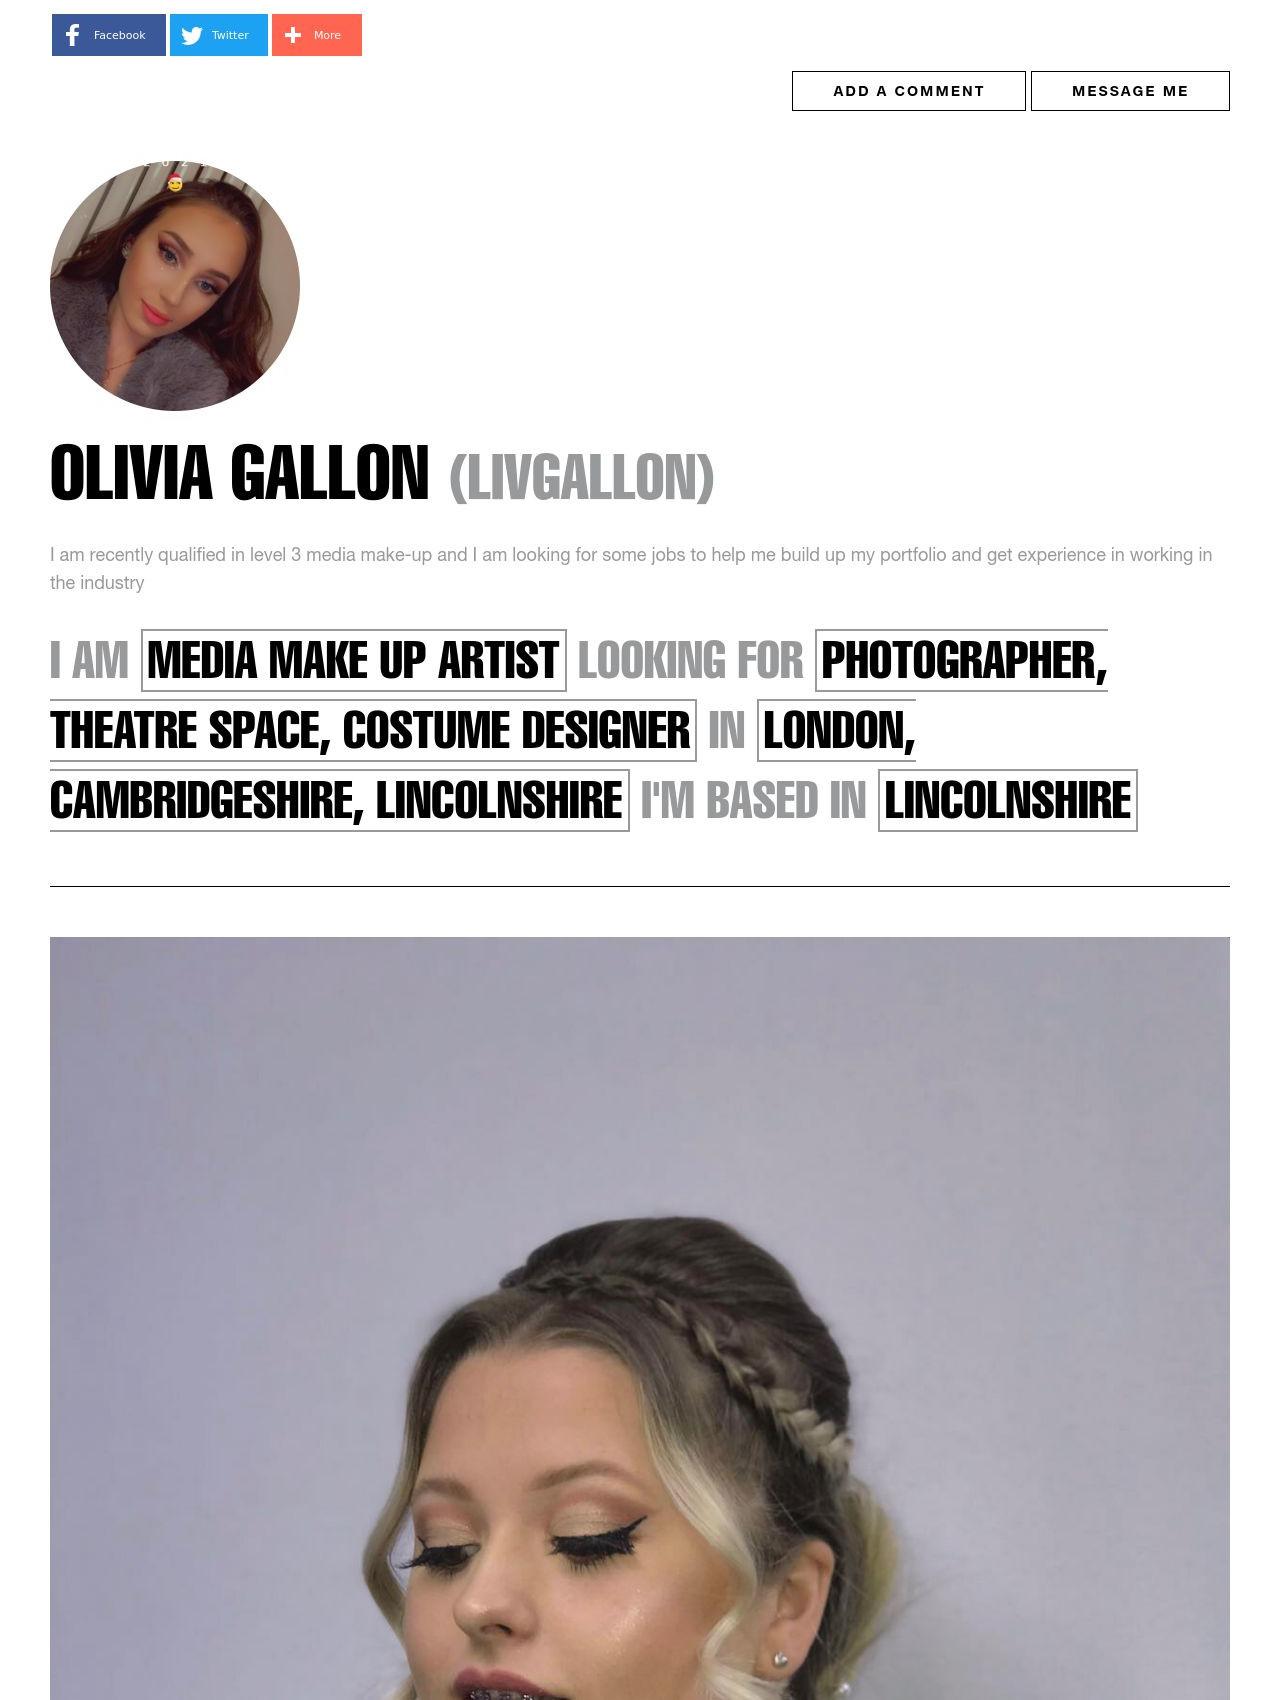 Olivia Gallon